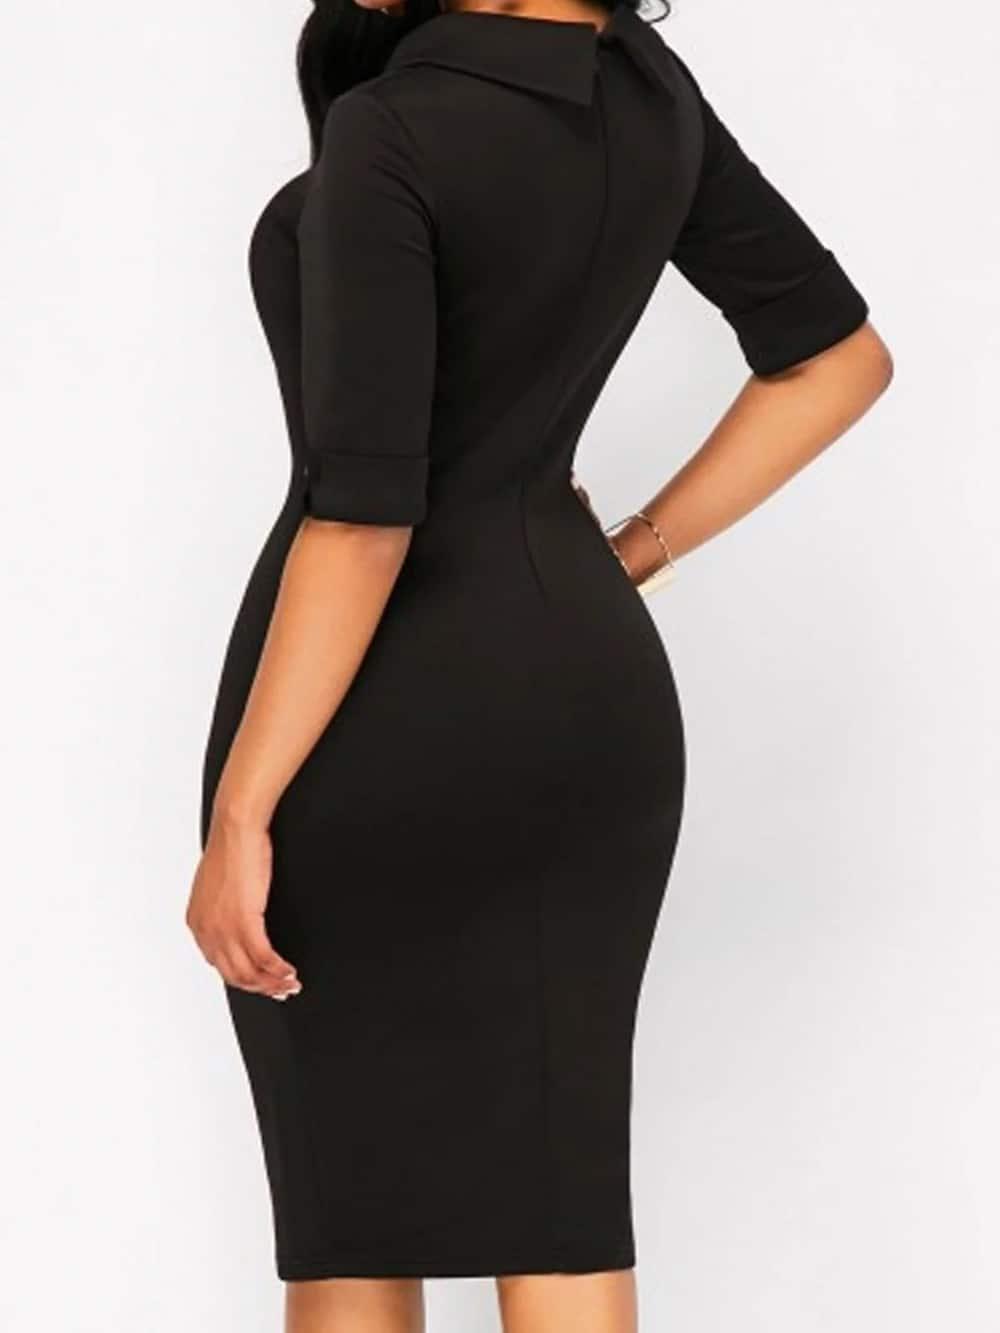 Official dresses for ladies in Kenya